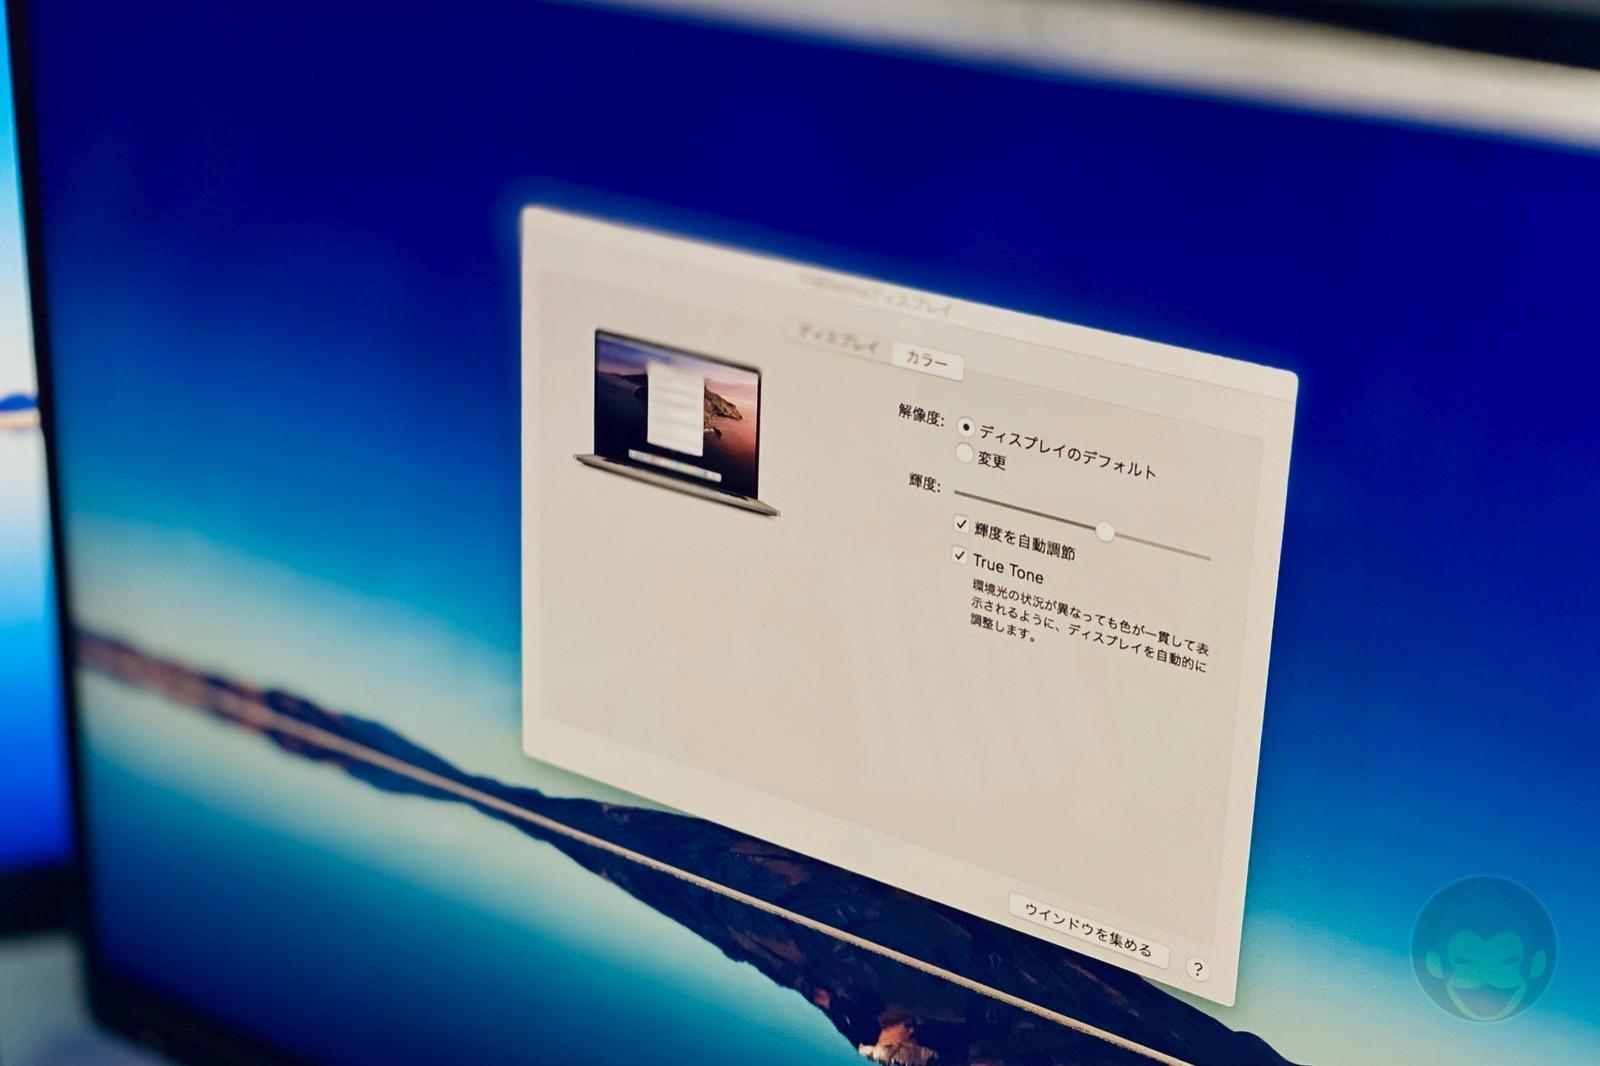 Display-Brightness-set-to-maximum-bug-01.jpeg